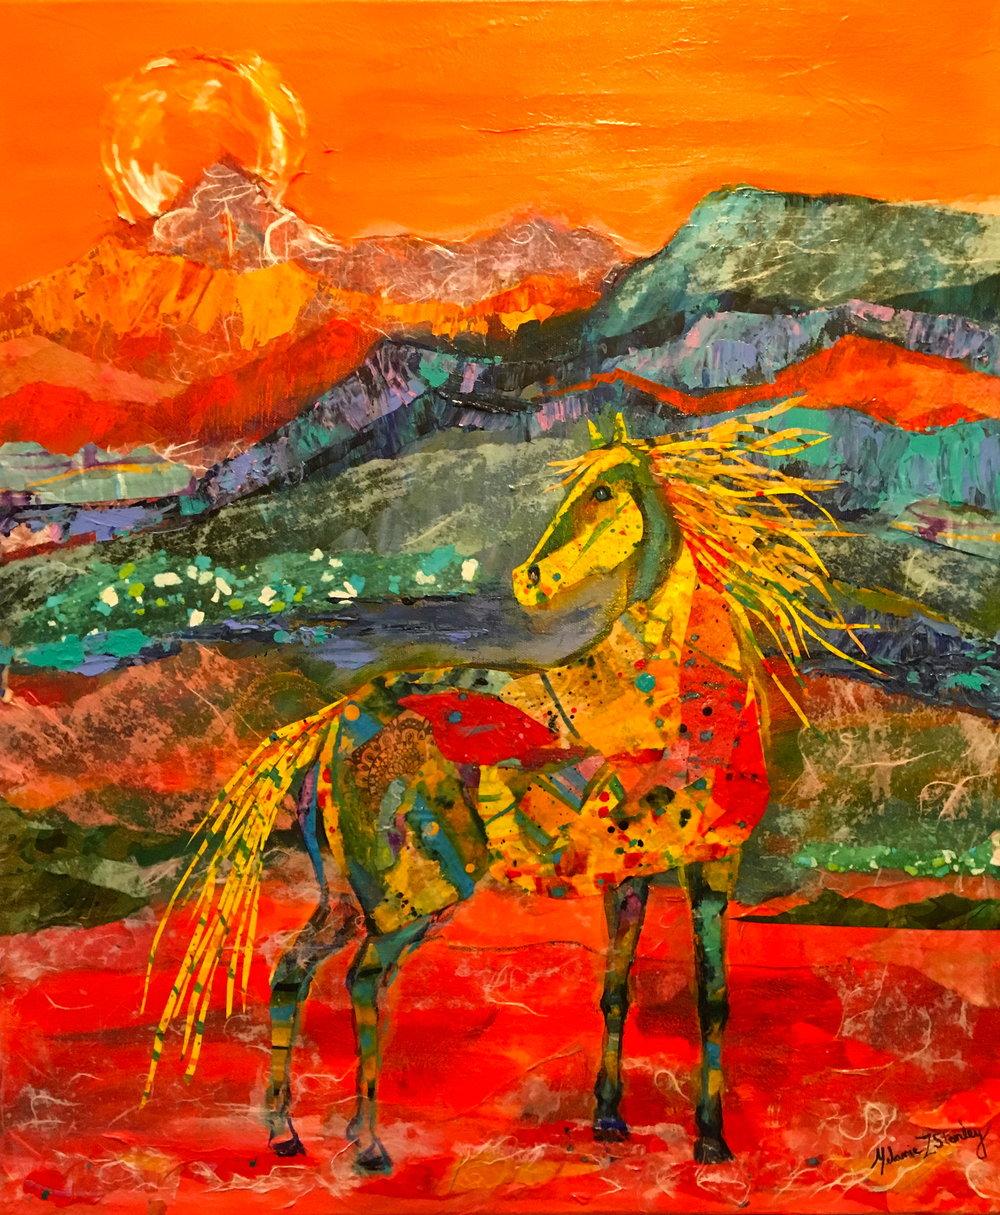 Stnaley Wild Horse Landscape.jpg